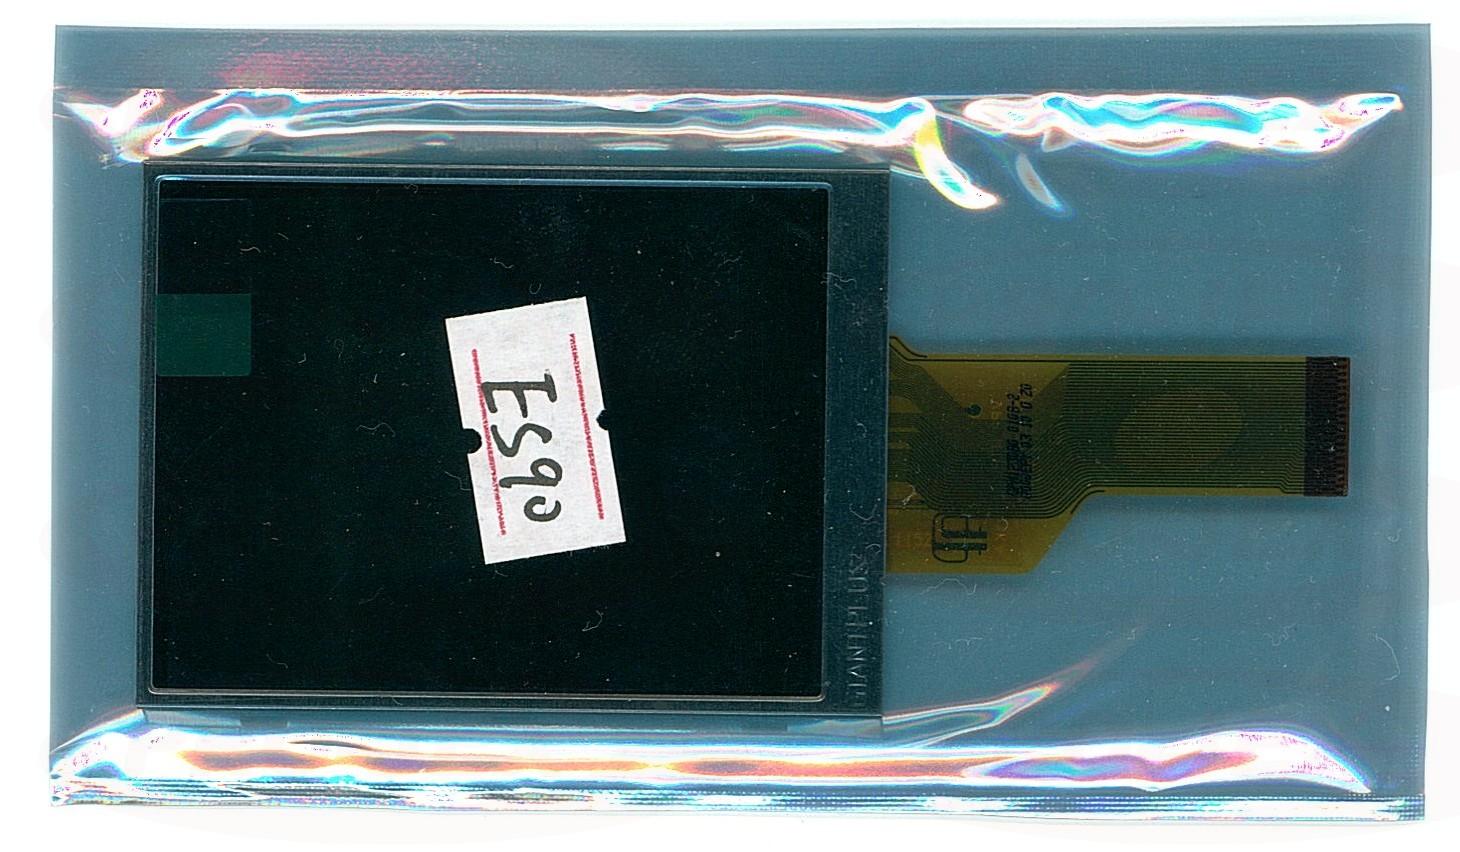 LCD Samsung ES90